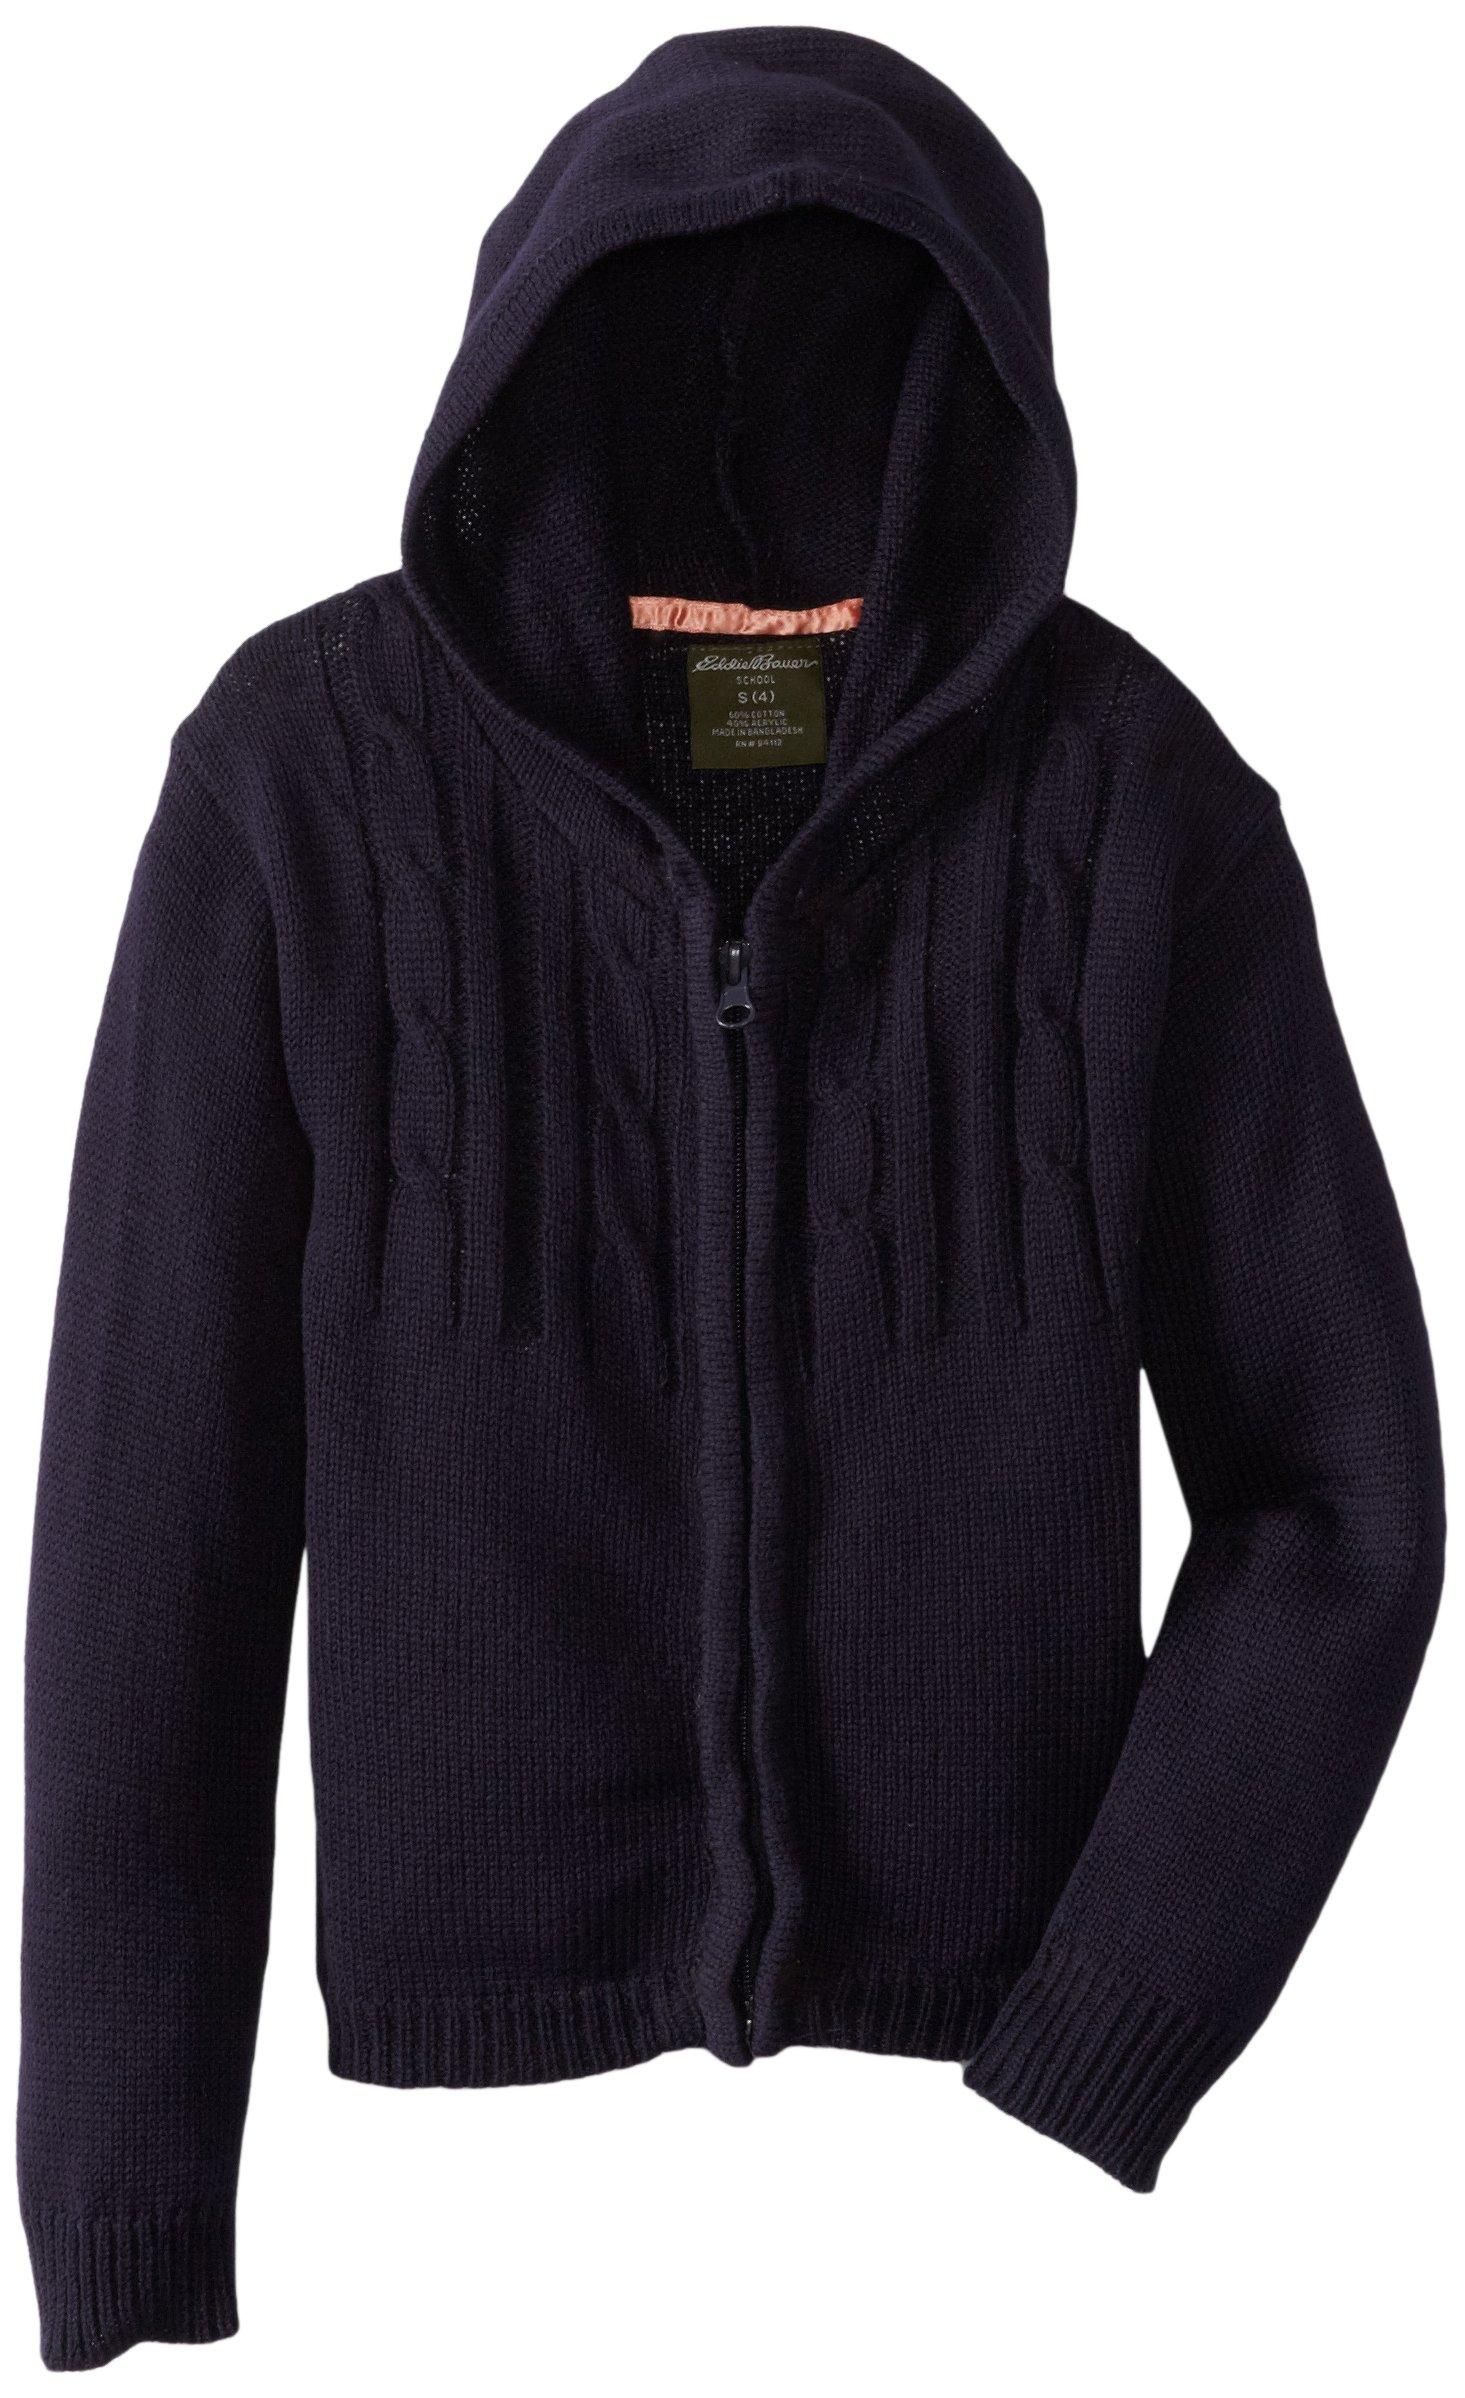 Eddie Bauer Girls' Sweater (More Styles Available), Navy Zip, 6X